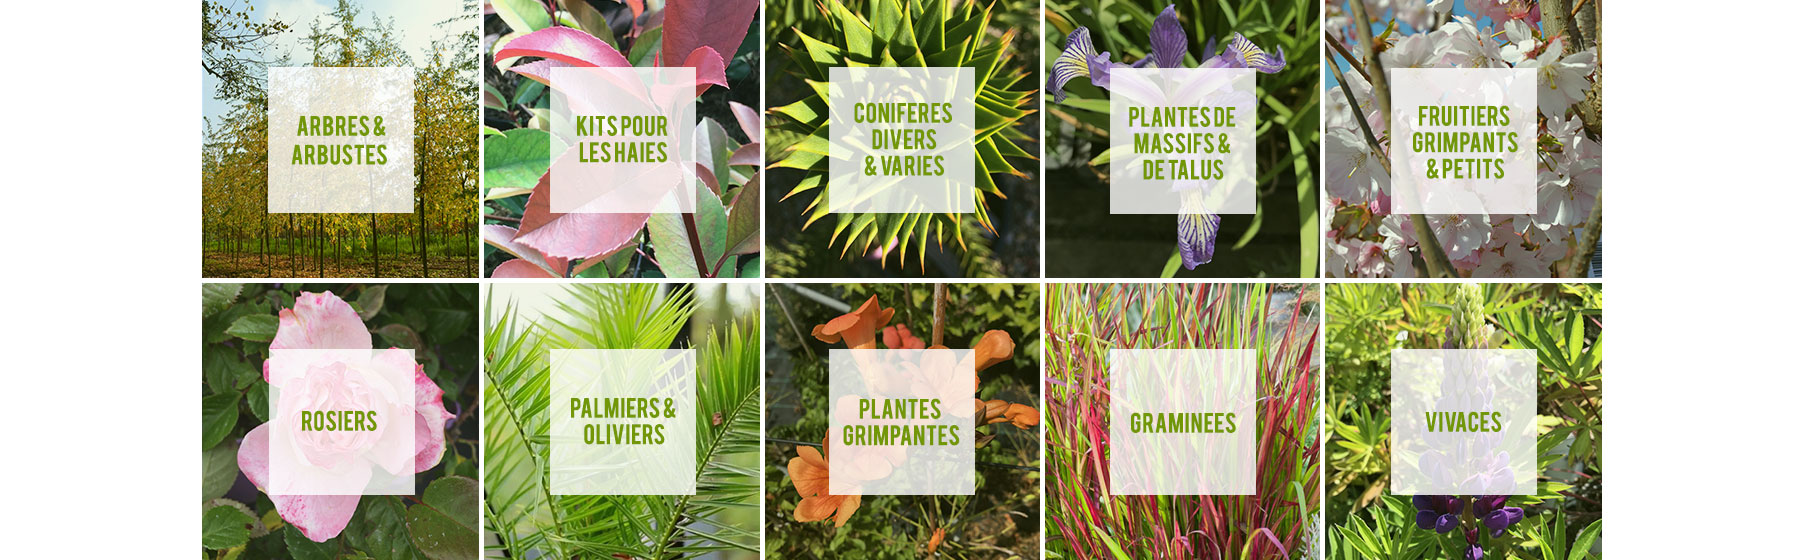 arbres&arbustes, haie, conifères, massif, fruitier, rosier, palmiers, oliviers, grimpantes, graminiees, vivaces-vente directe